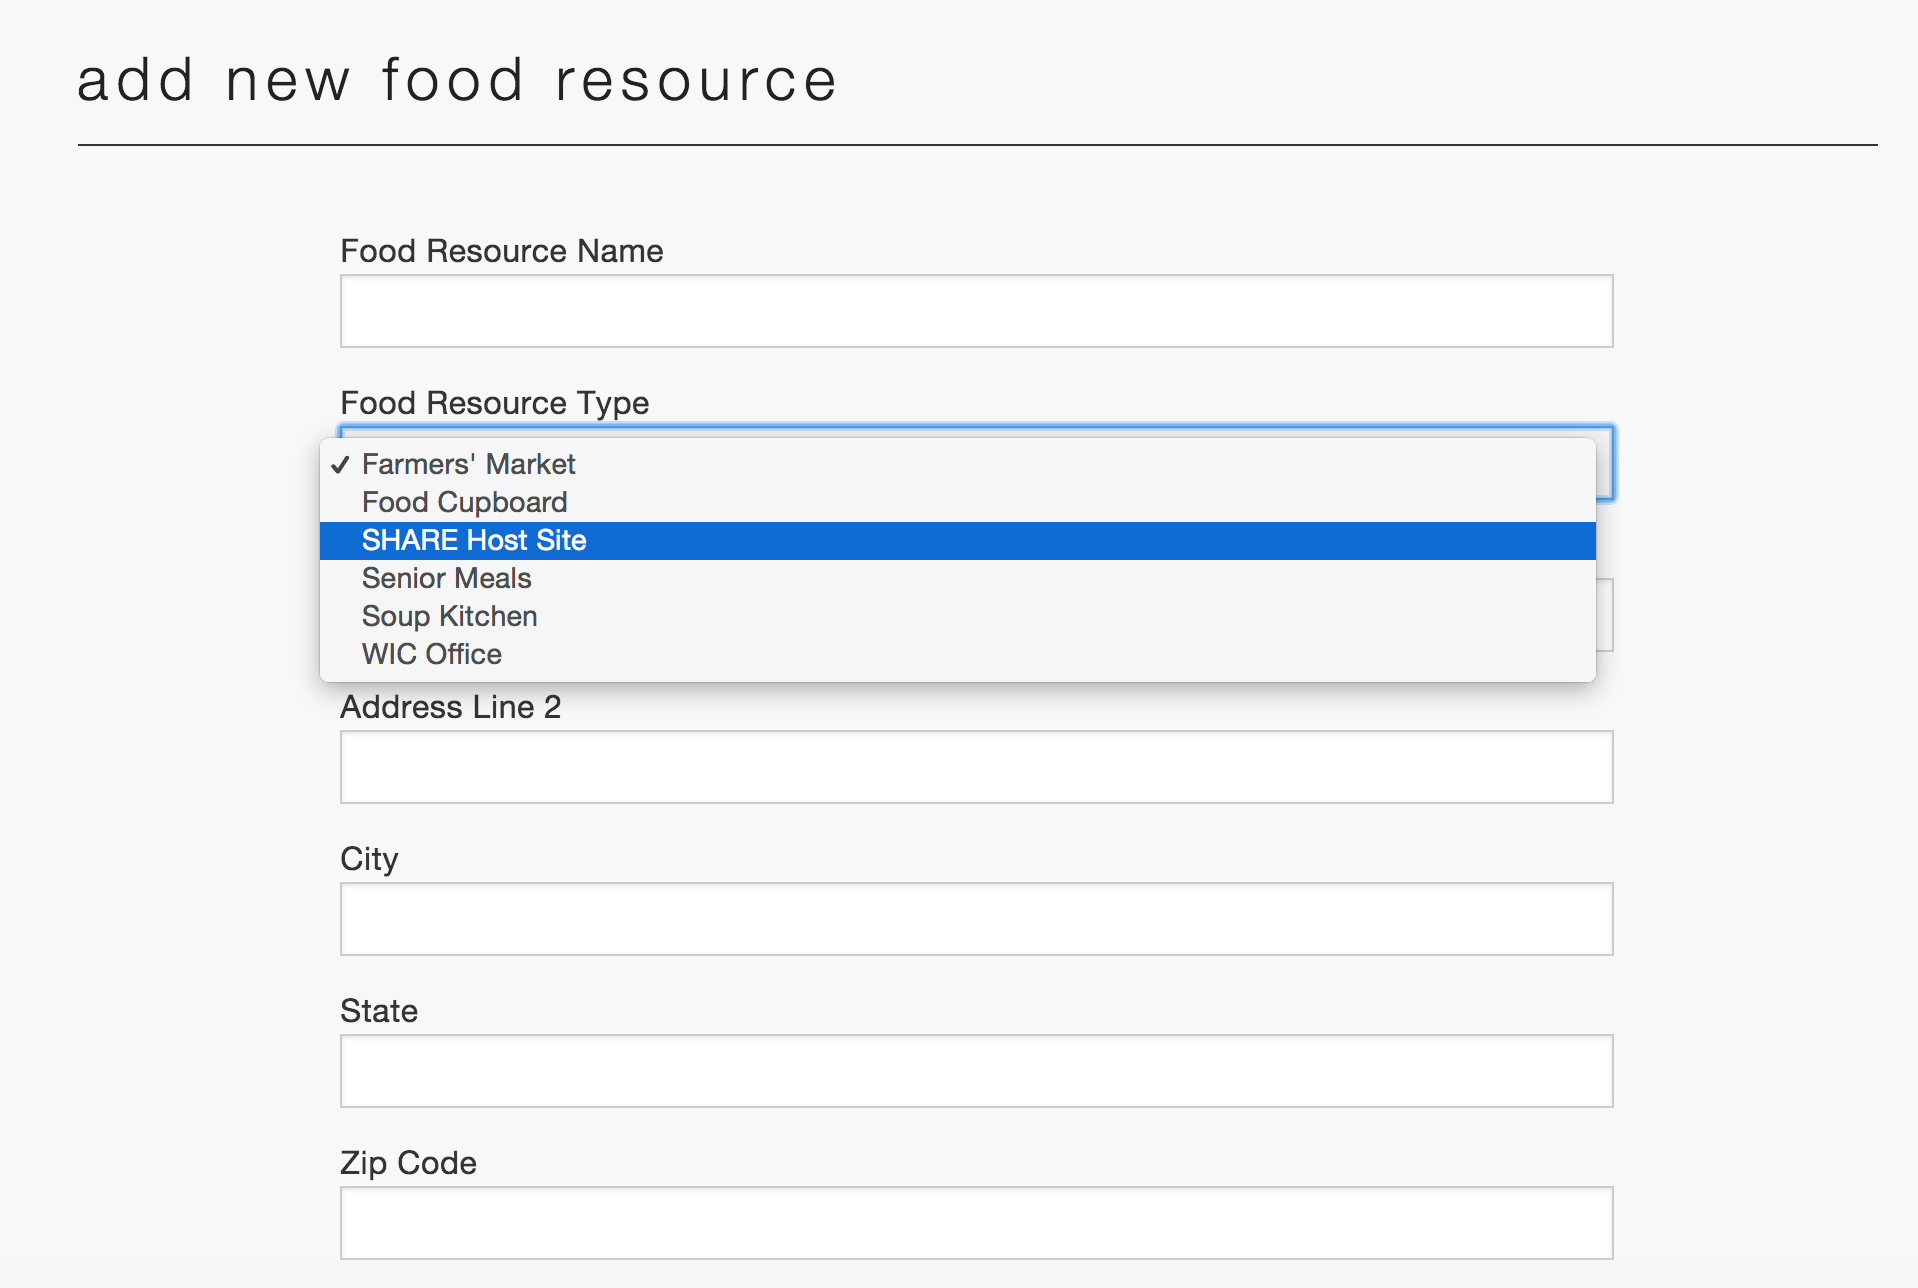 Add new food resource